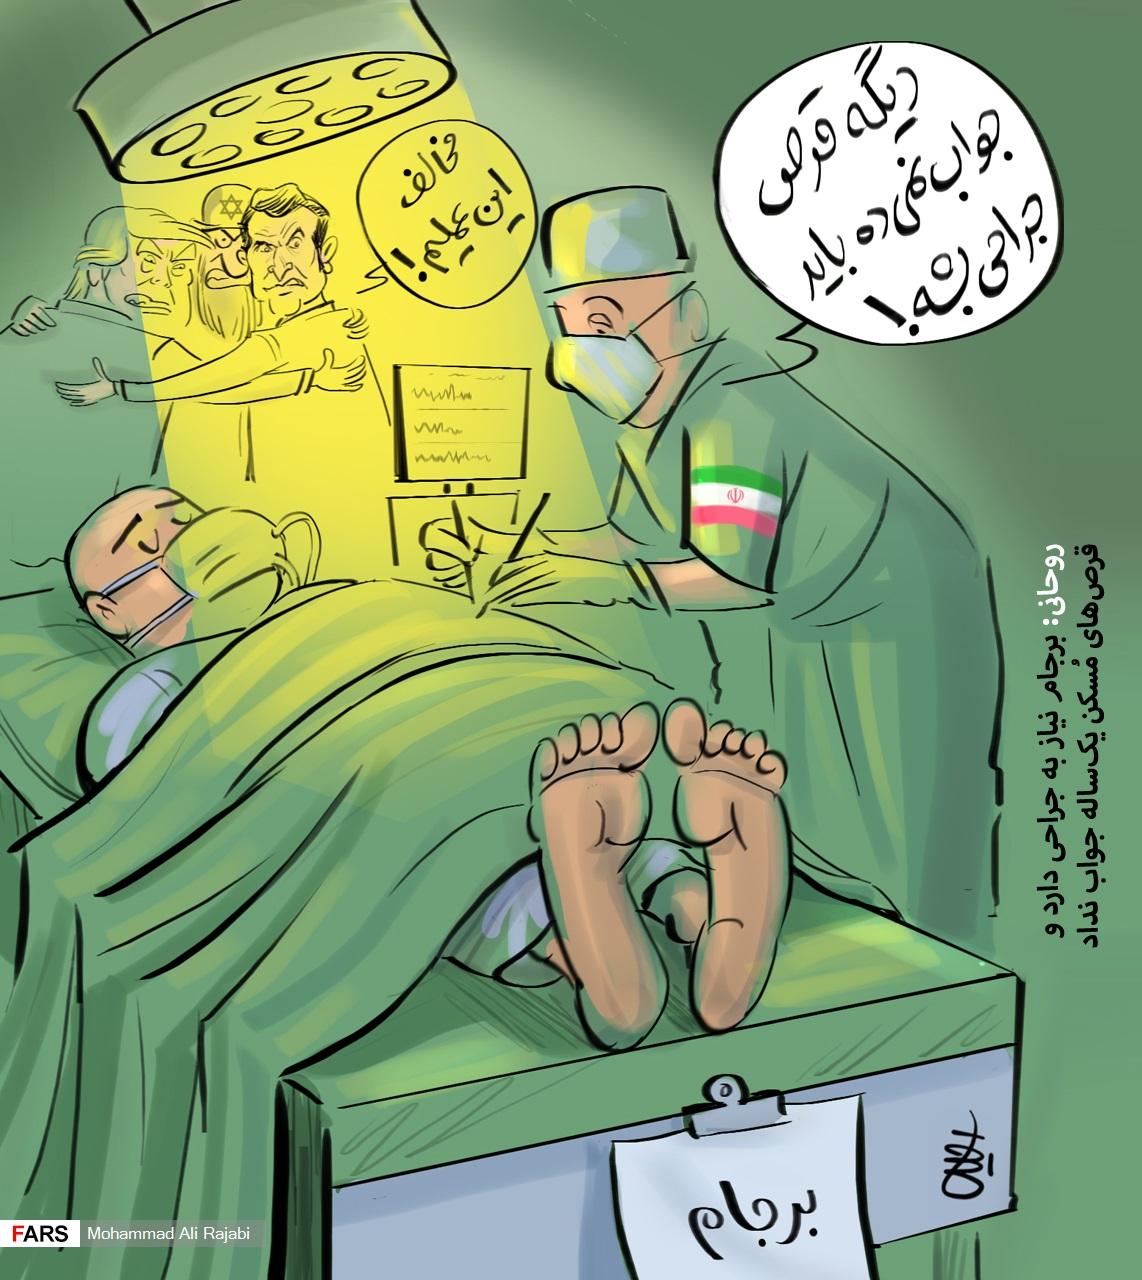 عکس خبري - کاريکاتور/ روحاني: برجام نياز به جراحي دارد